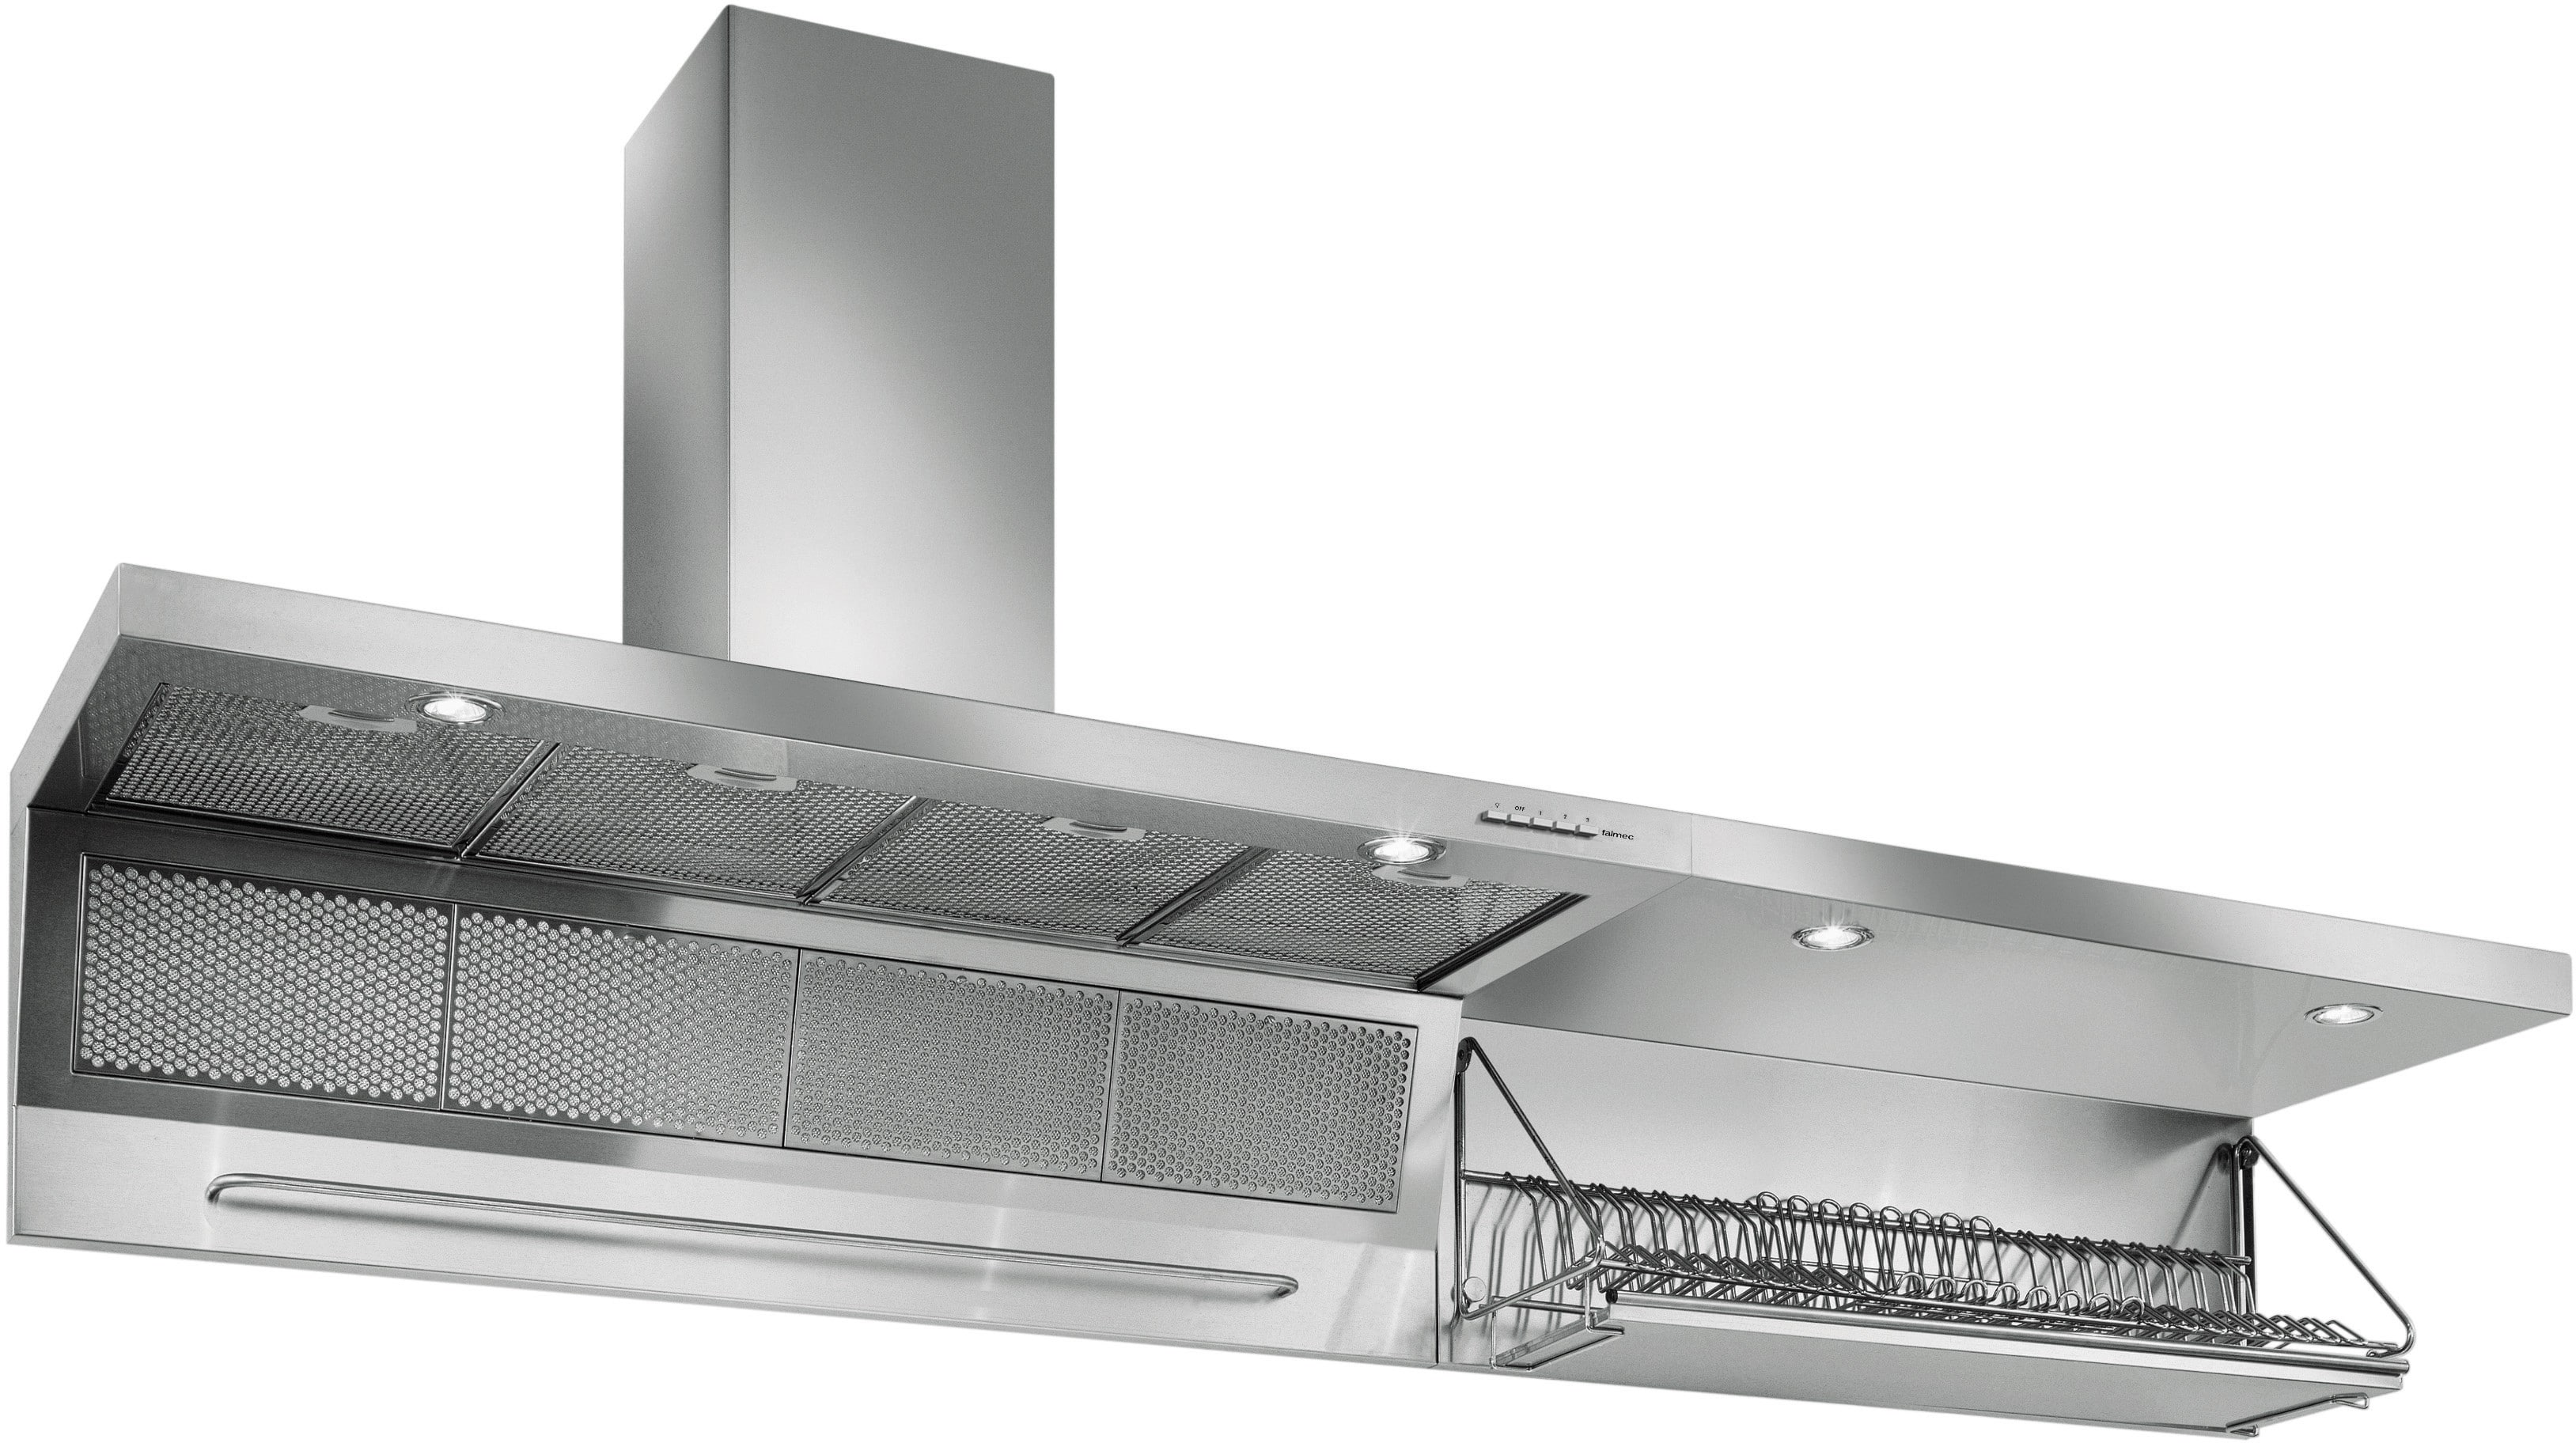 Restaurant Kitchen Hoods Stainless Steel futuro futuro wl72masterstn wall mount range hood with 940 cfm